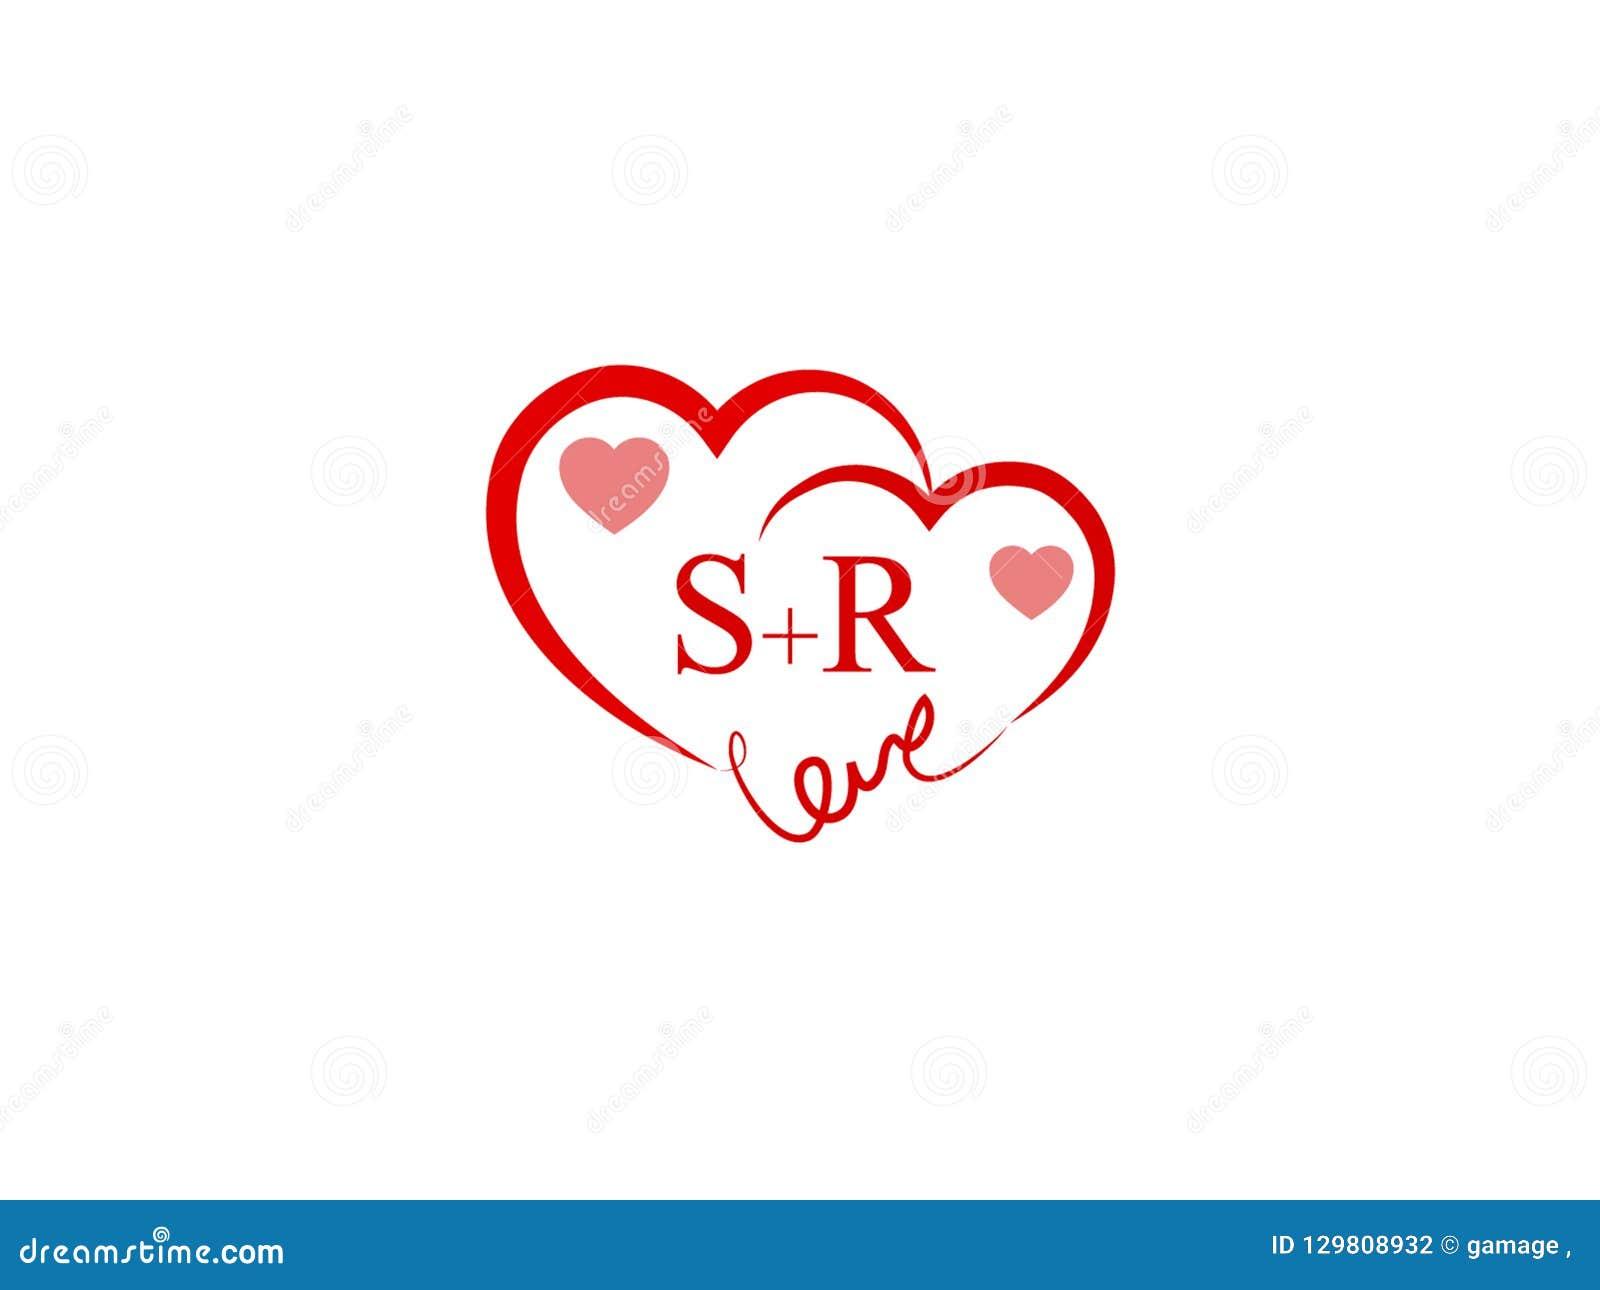 Sr Initial Heart Shape Red Colored Logo Stock Vector Illustration Of Design Flat 129808932